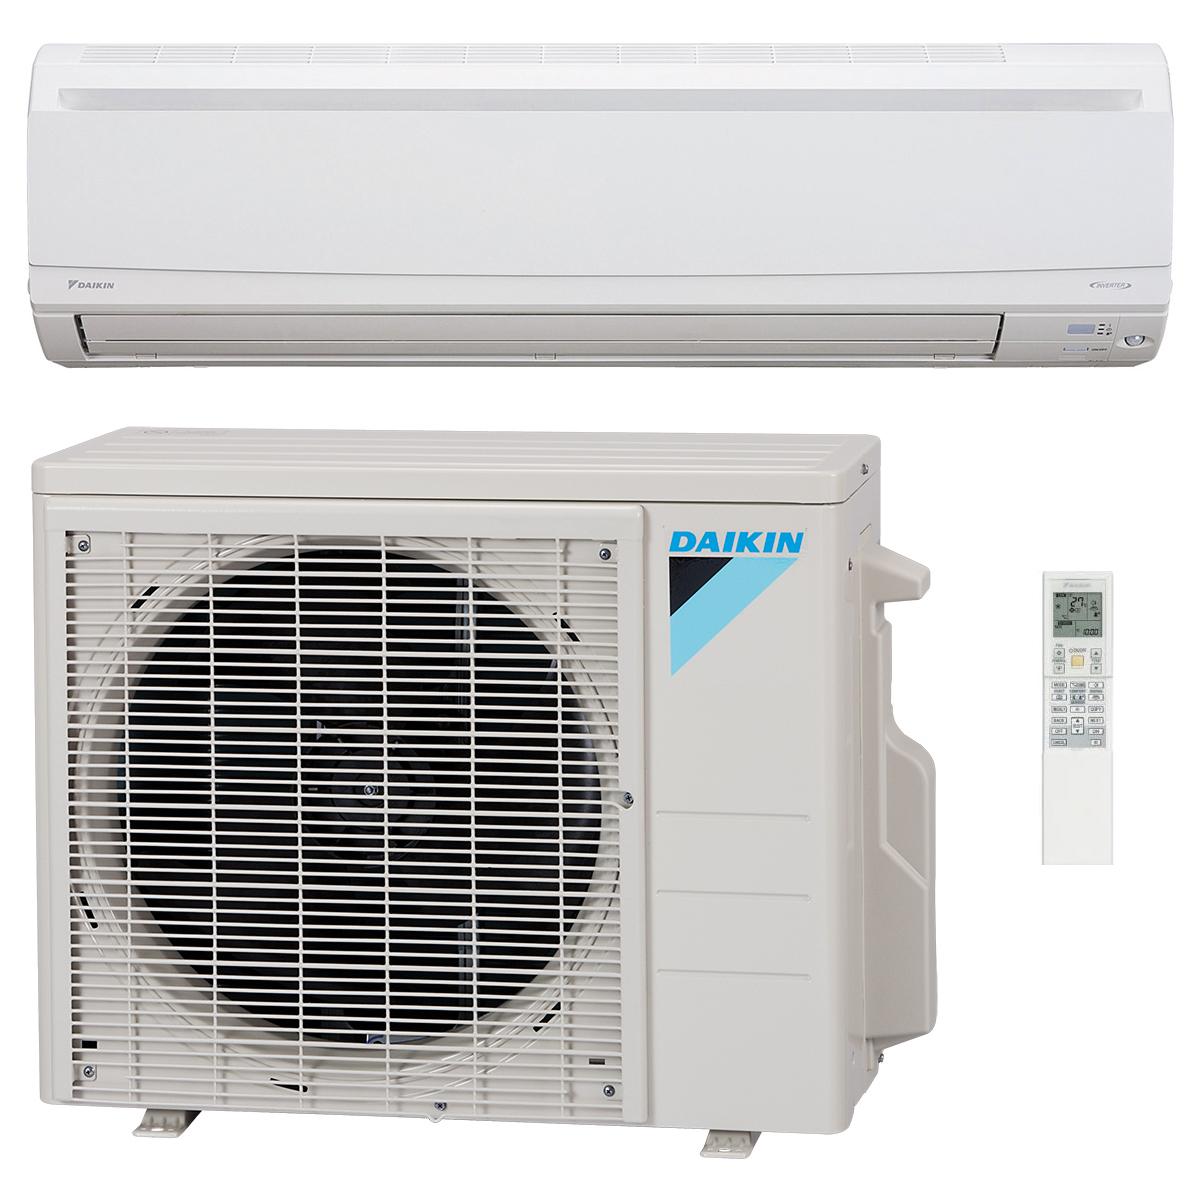 Daikin 24000 Btu 20 Seer Mini Split Heat Pump Ftxs24lvju Rxs24lvju Inverter Air Conditioner Wiring Diagram Lv Series